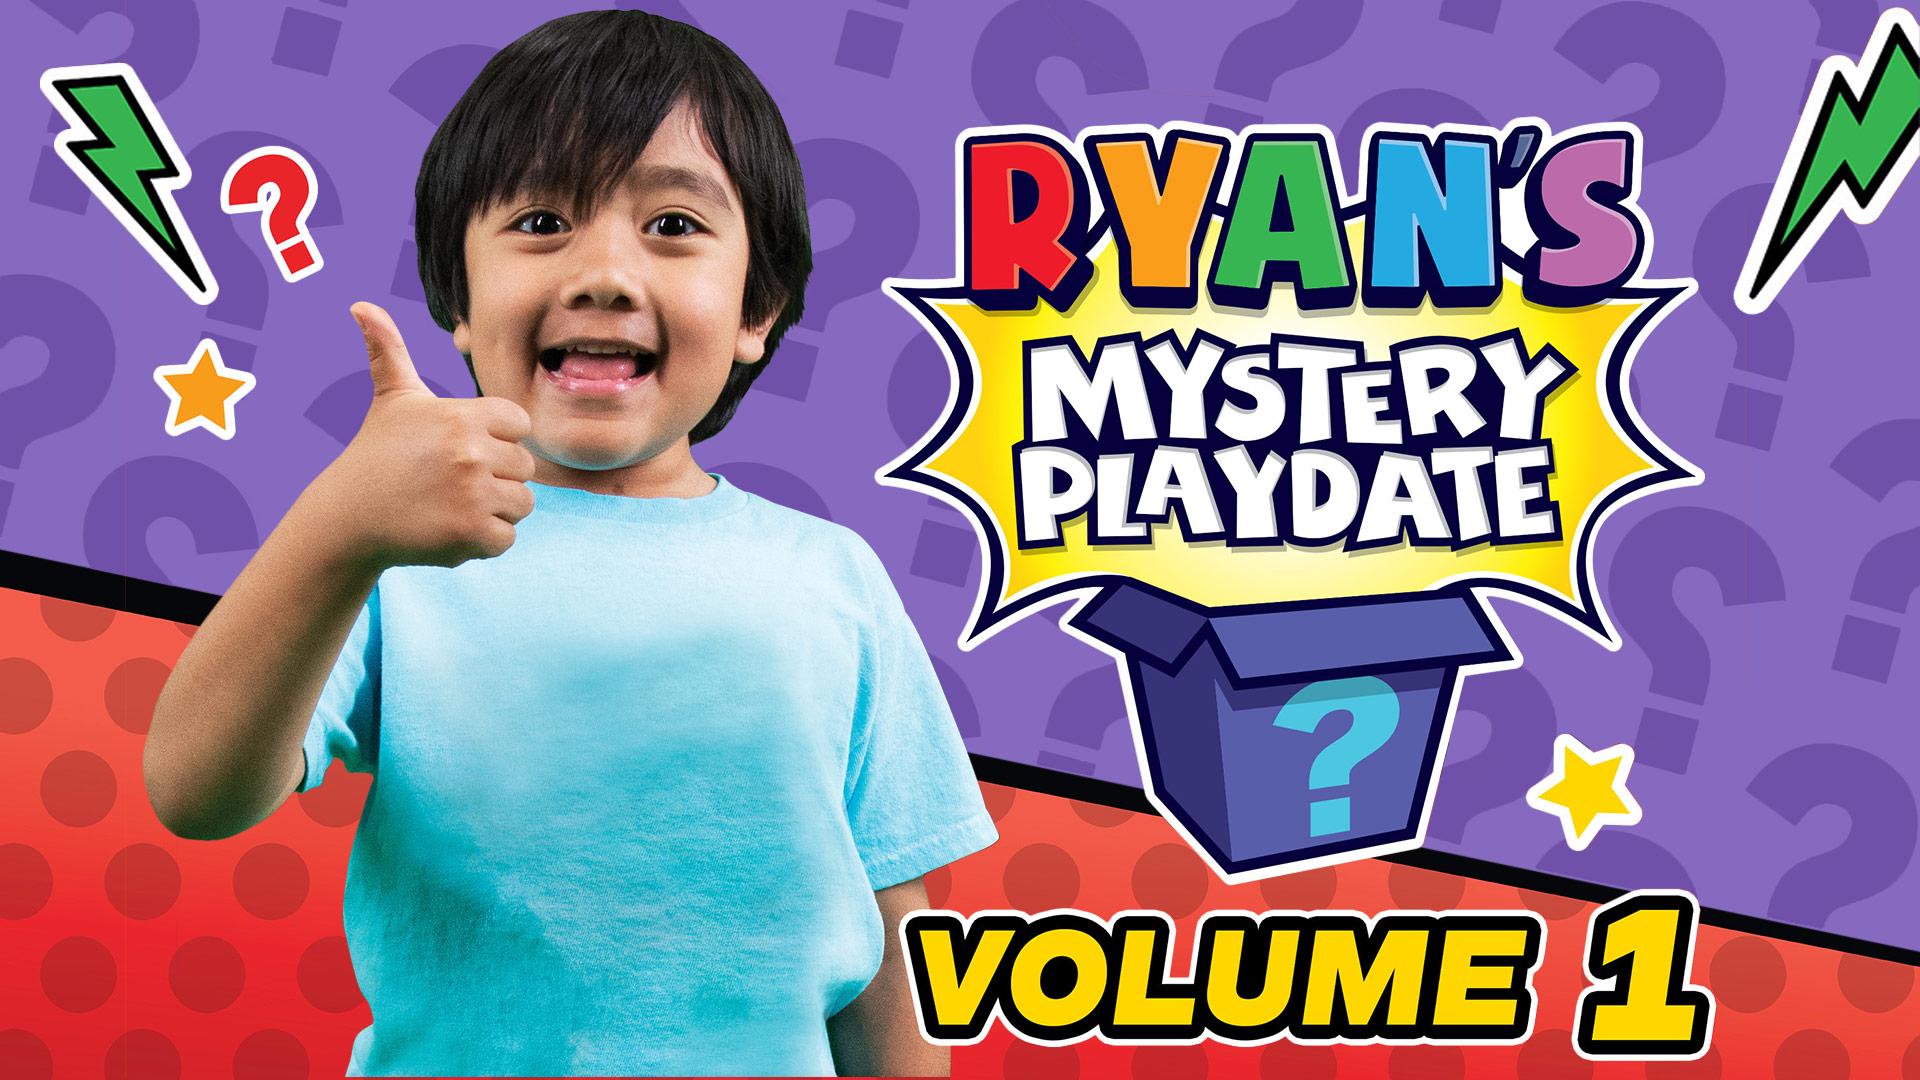 Ryan's Mystery Playdate Season 1